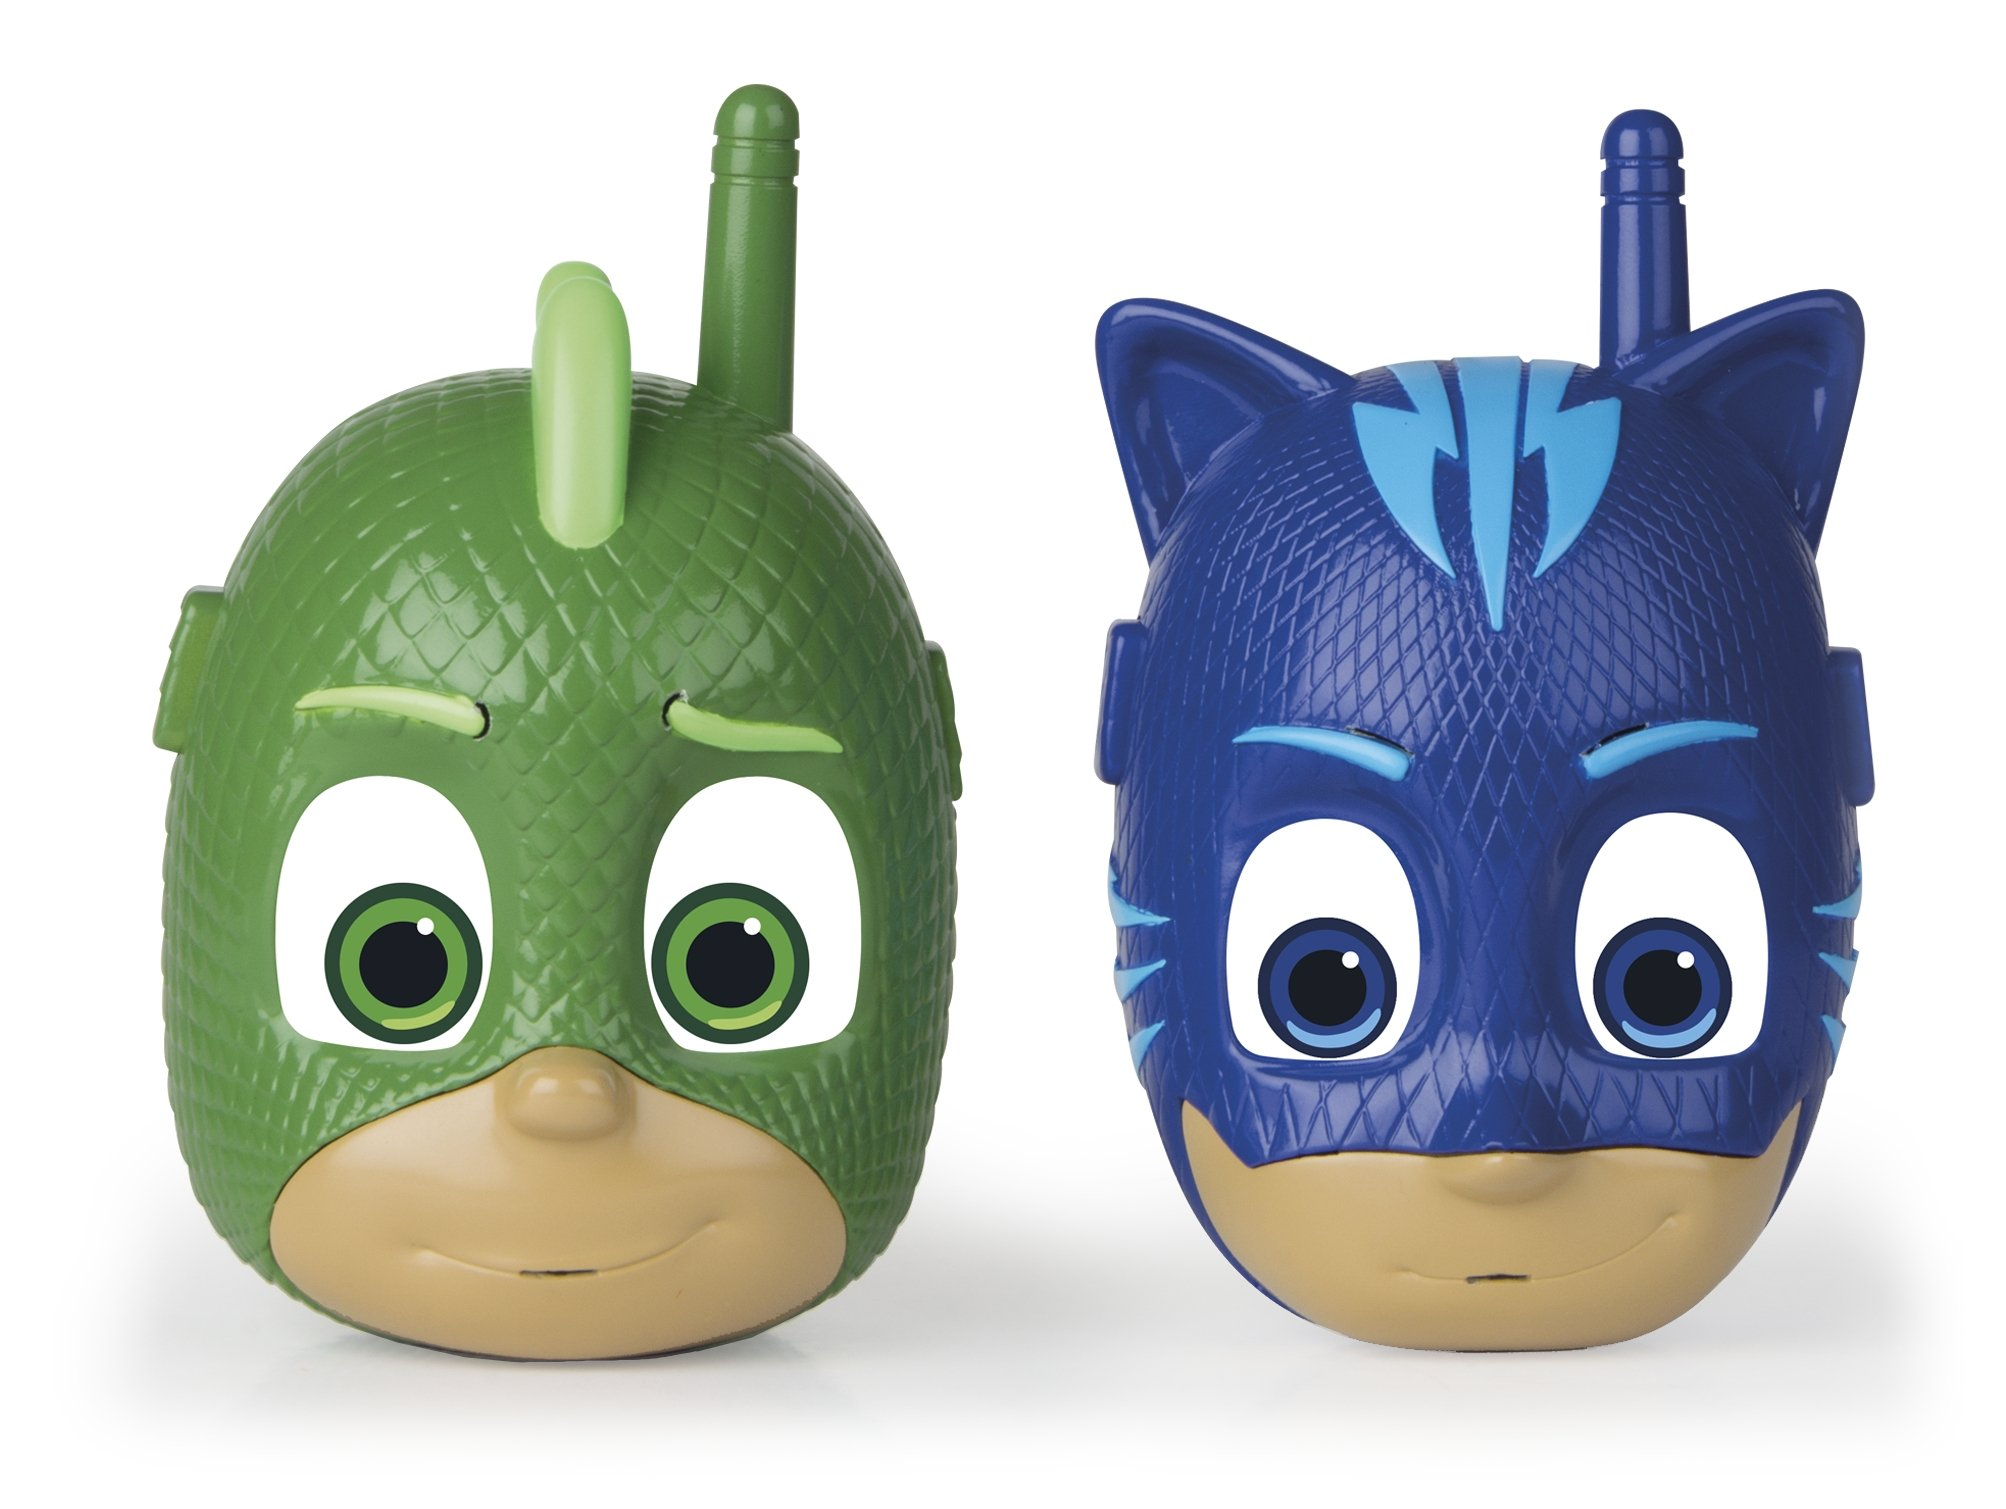 The Avengers PJ Masks Walkie Talkies